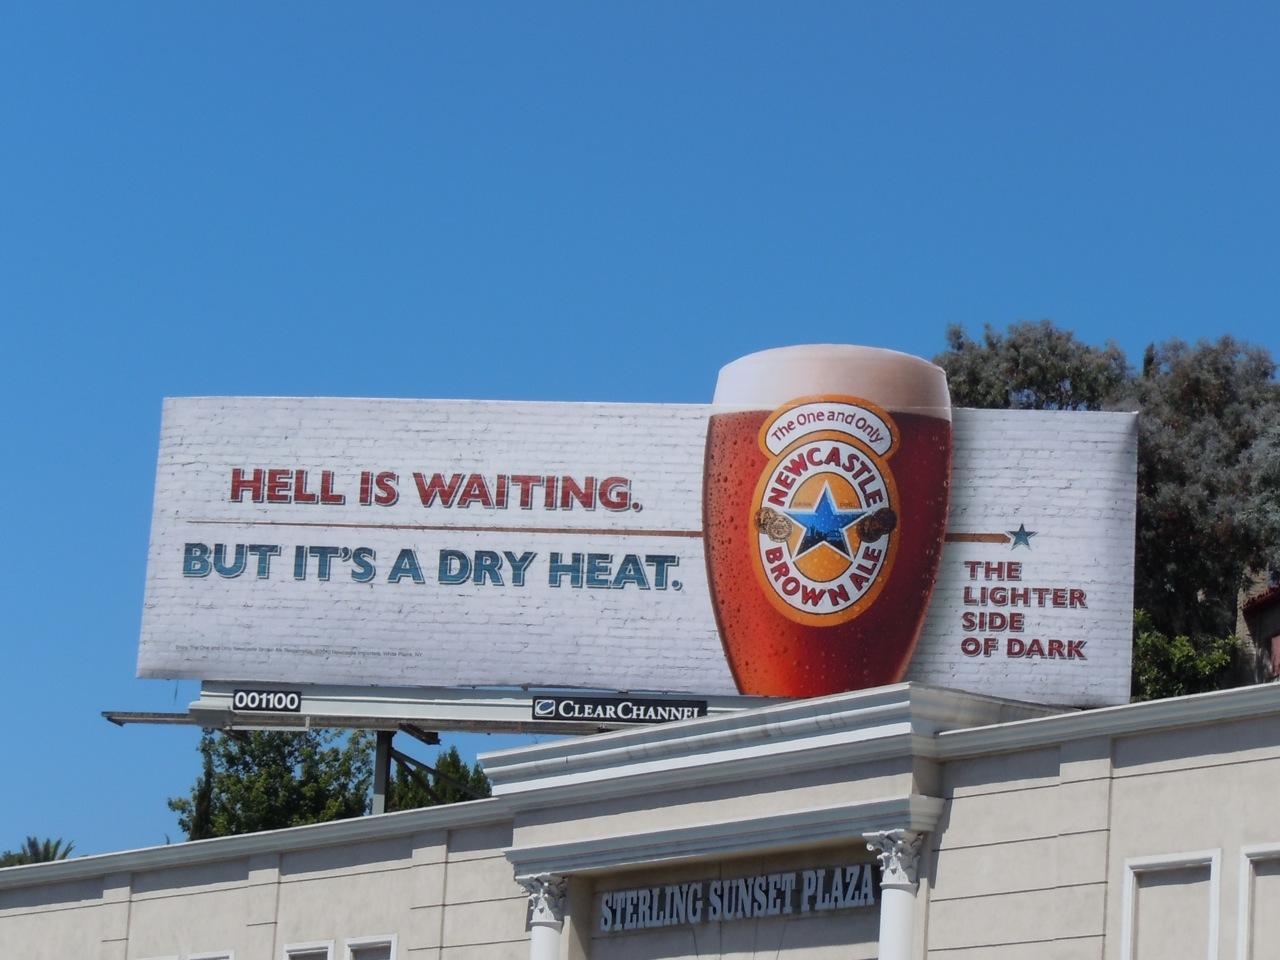 http://1.bp.blogspot.com/_GIchwvJ-aNk/TGl0fEOVU1I/AAAAAAAAT6o/NptyGTR7Q8U/s1600/Newcastle+brown+Dry+Heat+billboard.jpg